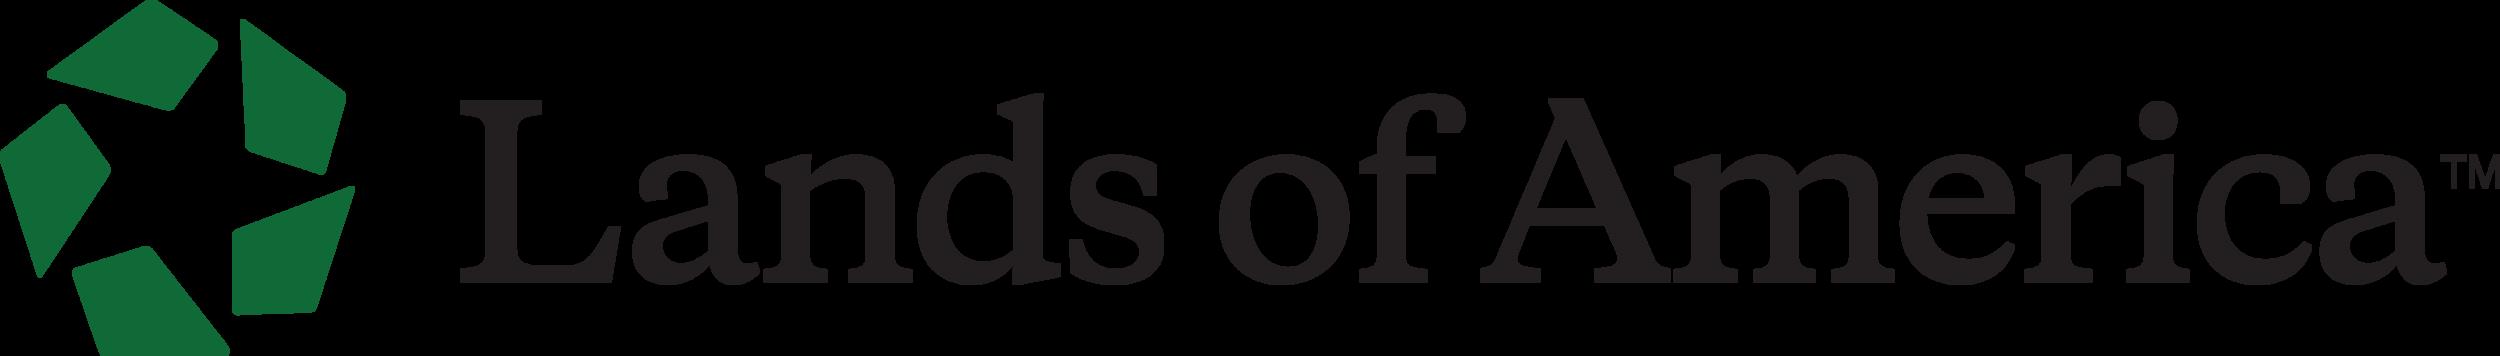 NEW-LOA-Logo.png